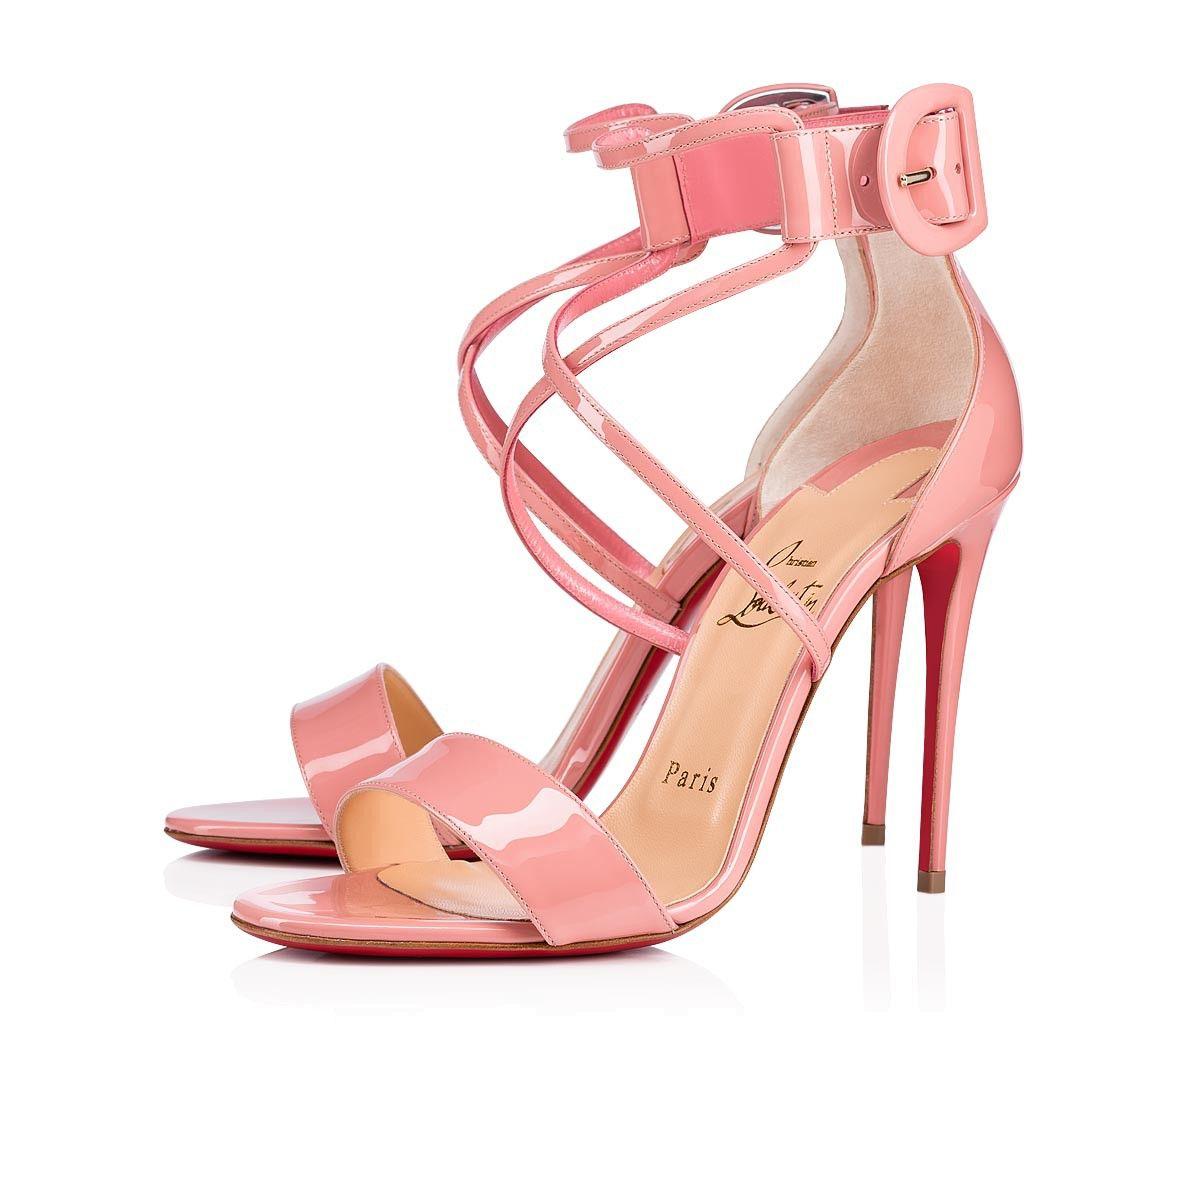 the best attitude 57210 fe8f9 Choca 100 Guimauve Patent Leather - Women Shoes - Christian ...